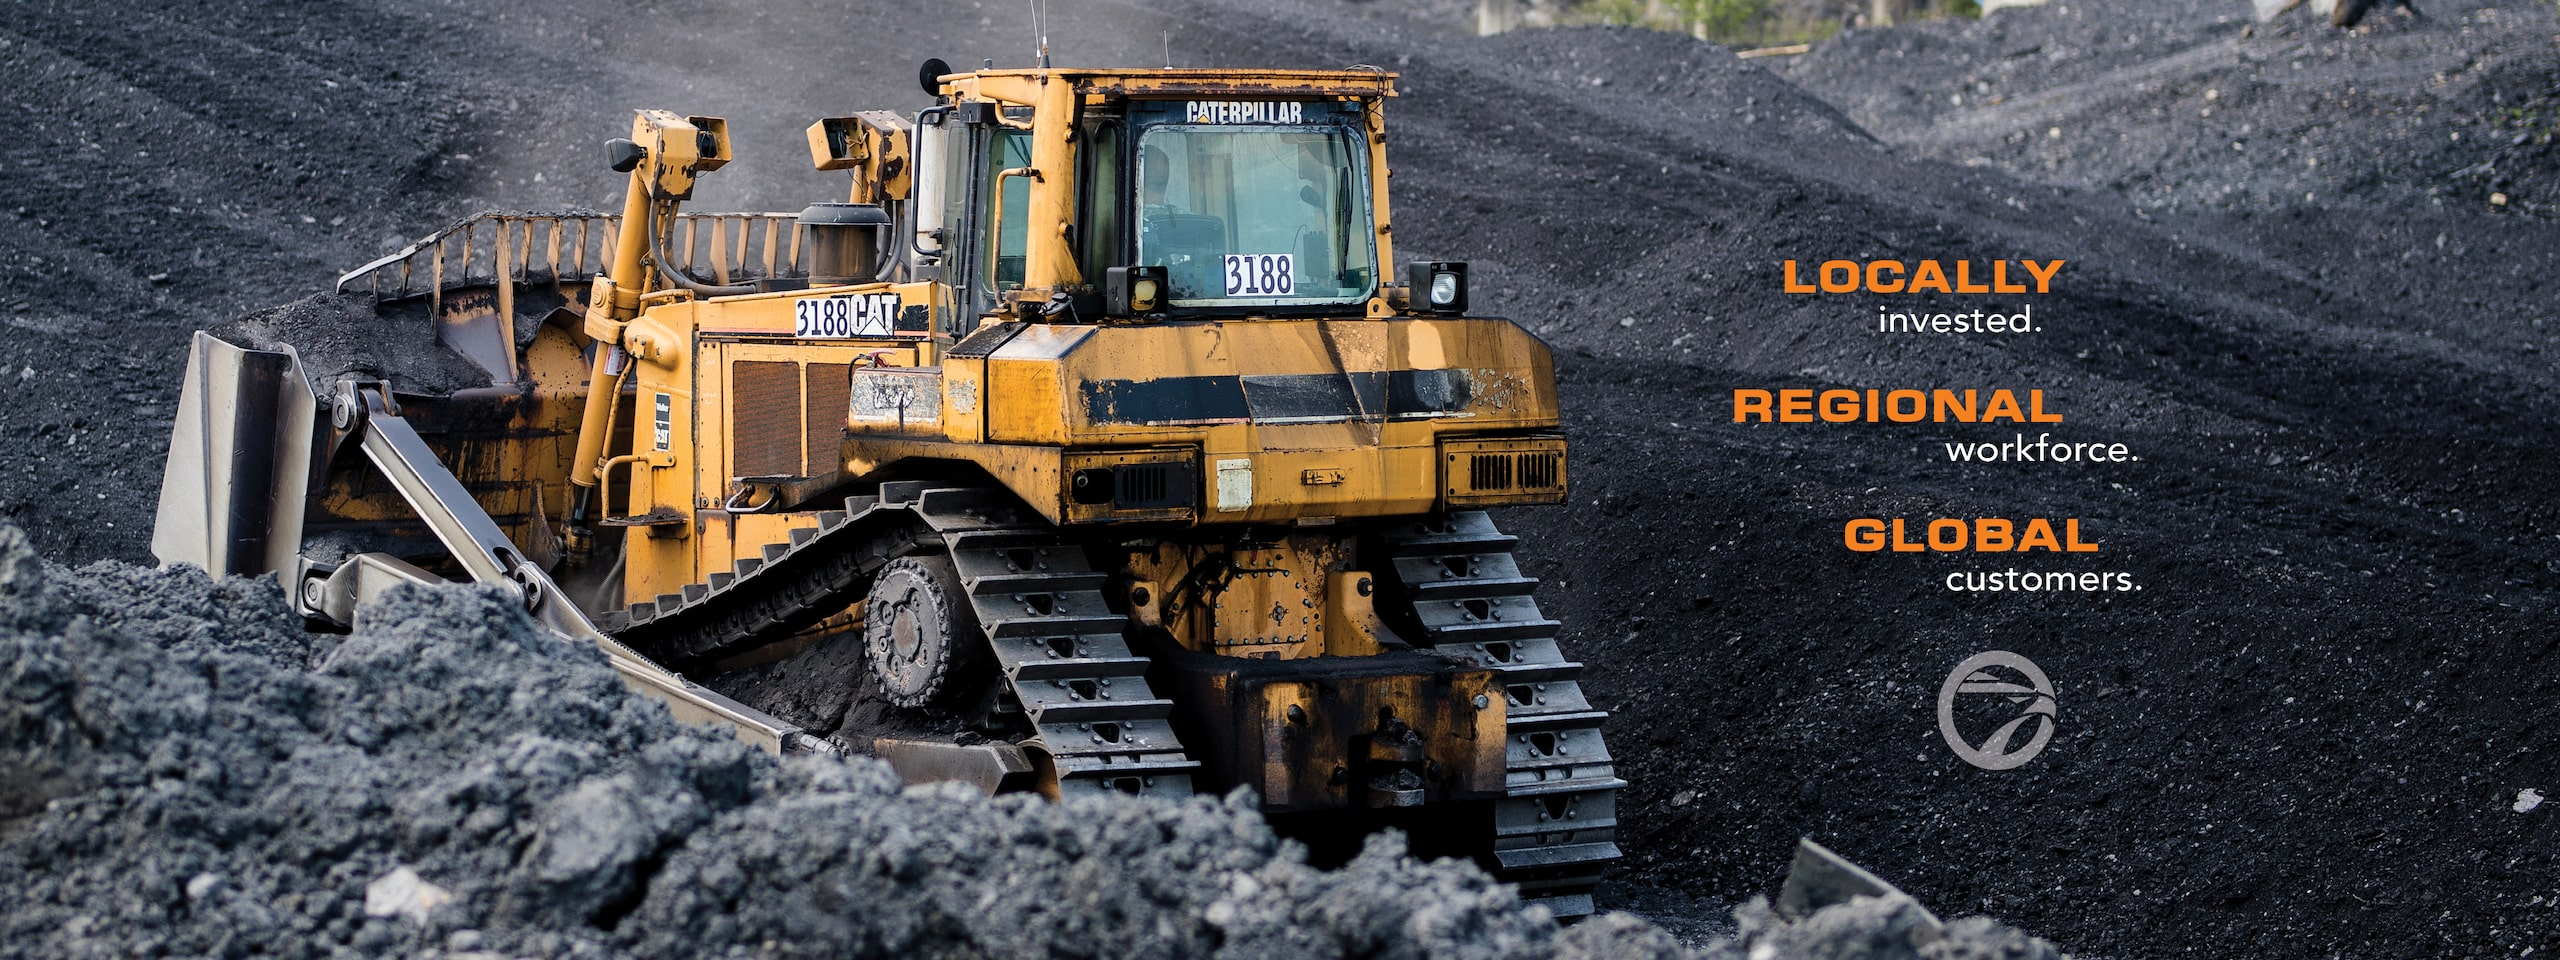 Blackhawk Mining LLC Operations